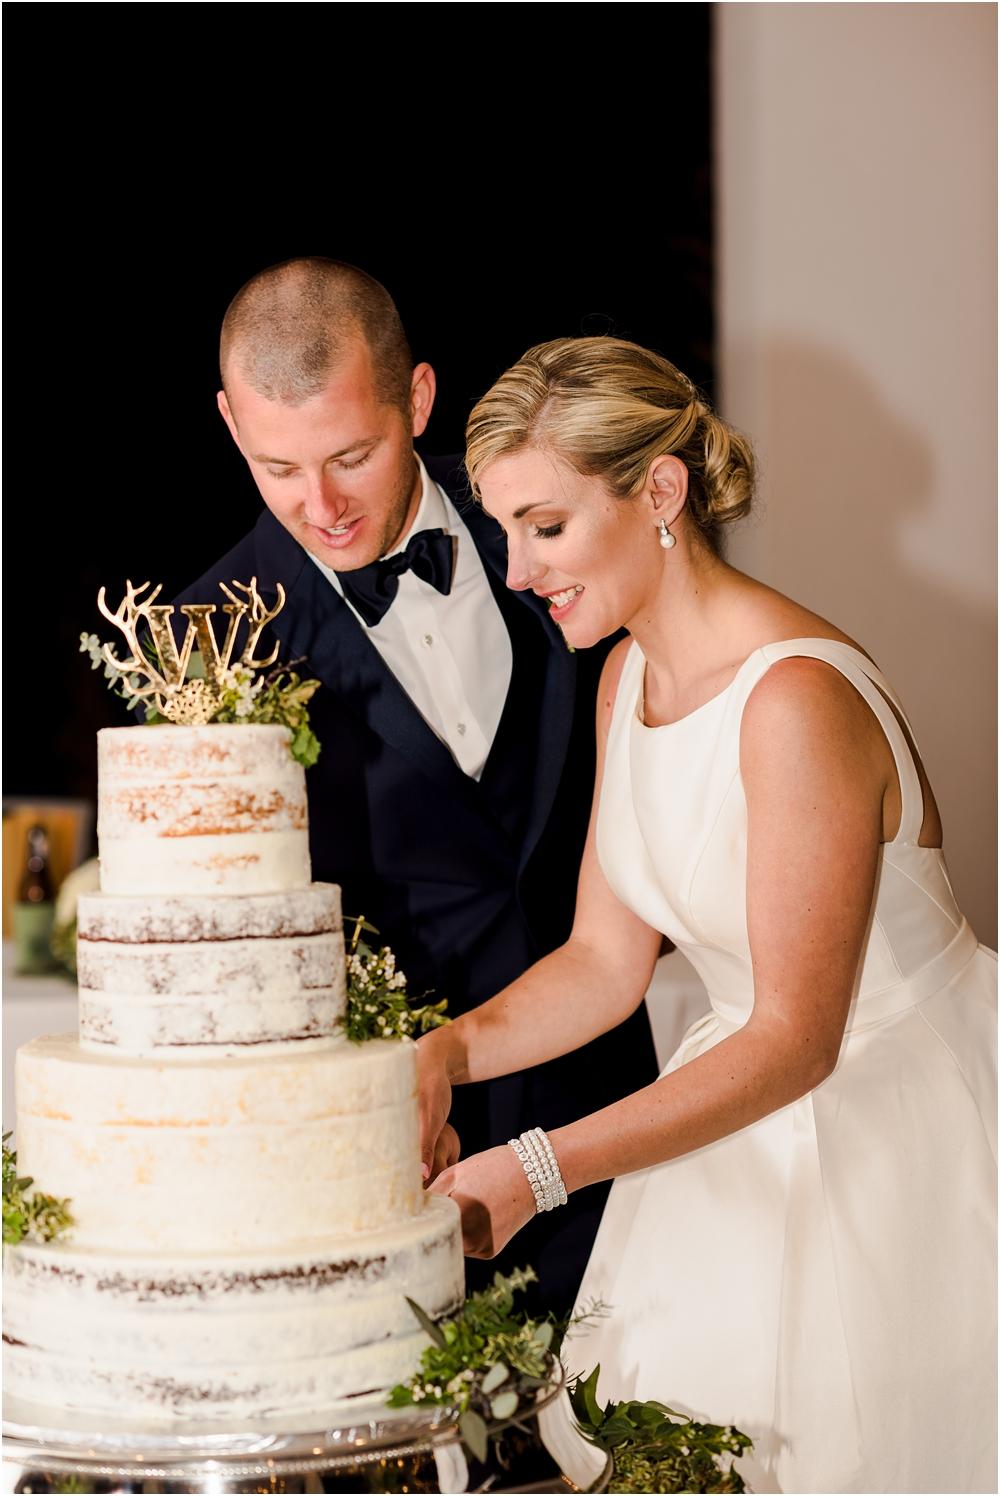 wilkins-sheraton-panama-city-beach-florida-wedding-dothan-tallahassee-kiersten-stevenson-photography-170.jpg